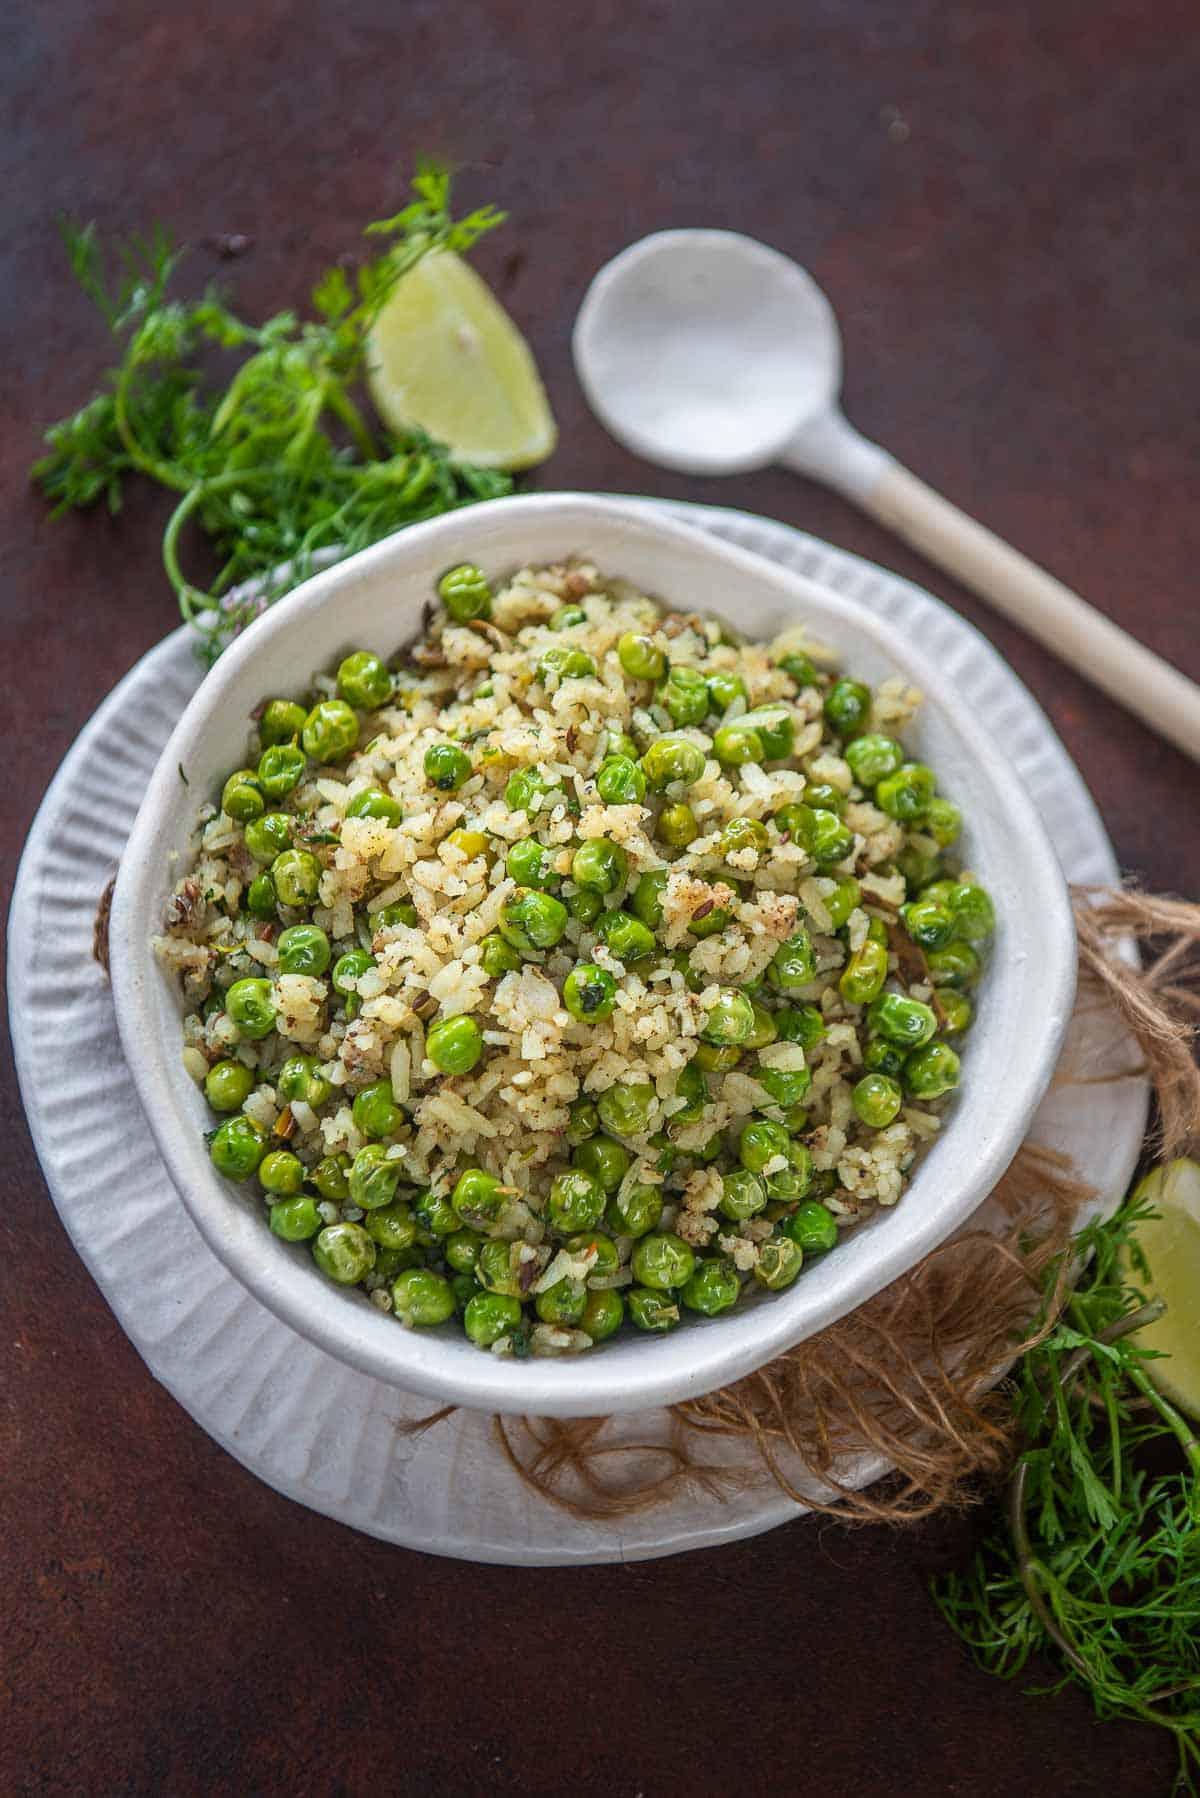 Chura Matar served in a bowl.